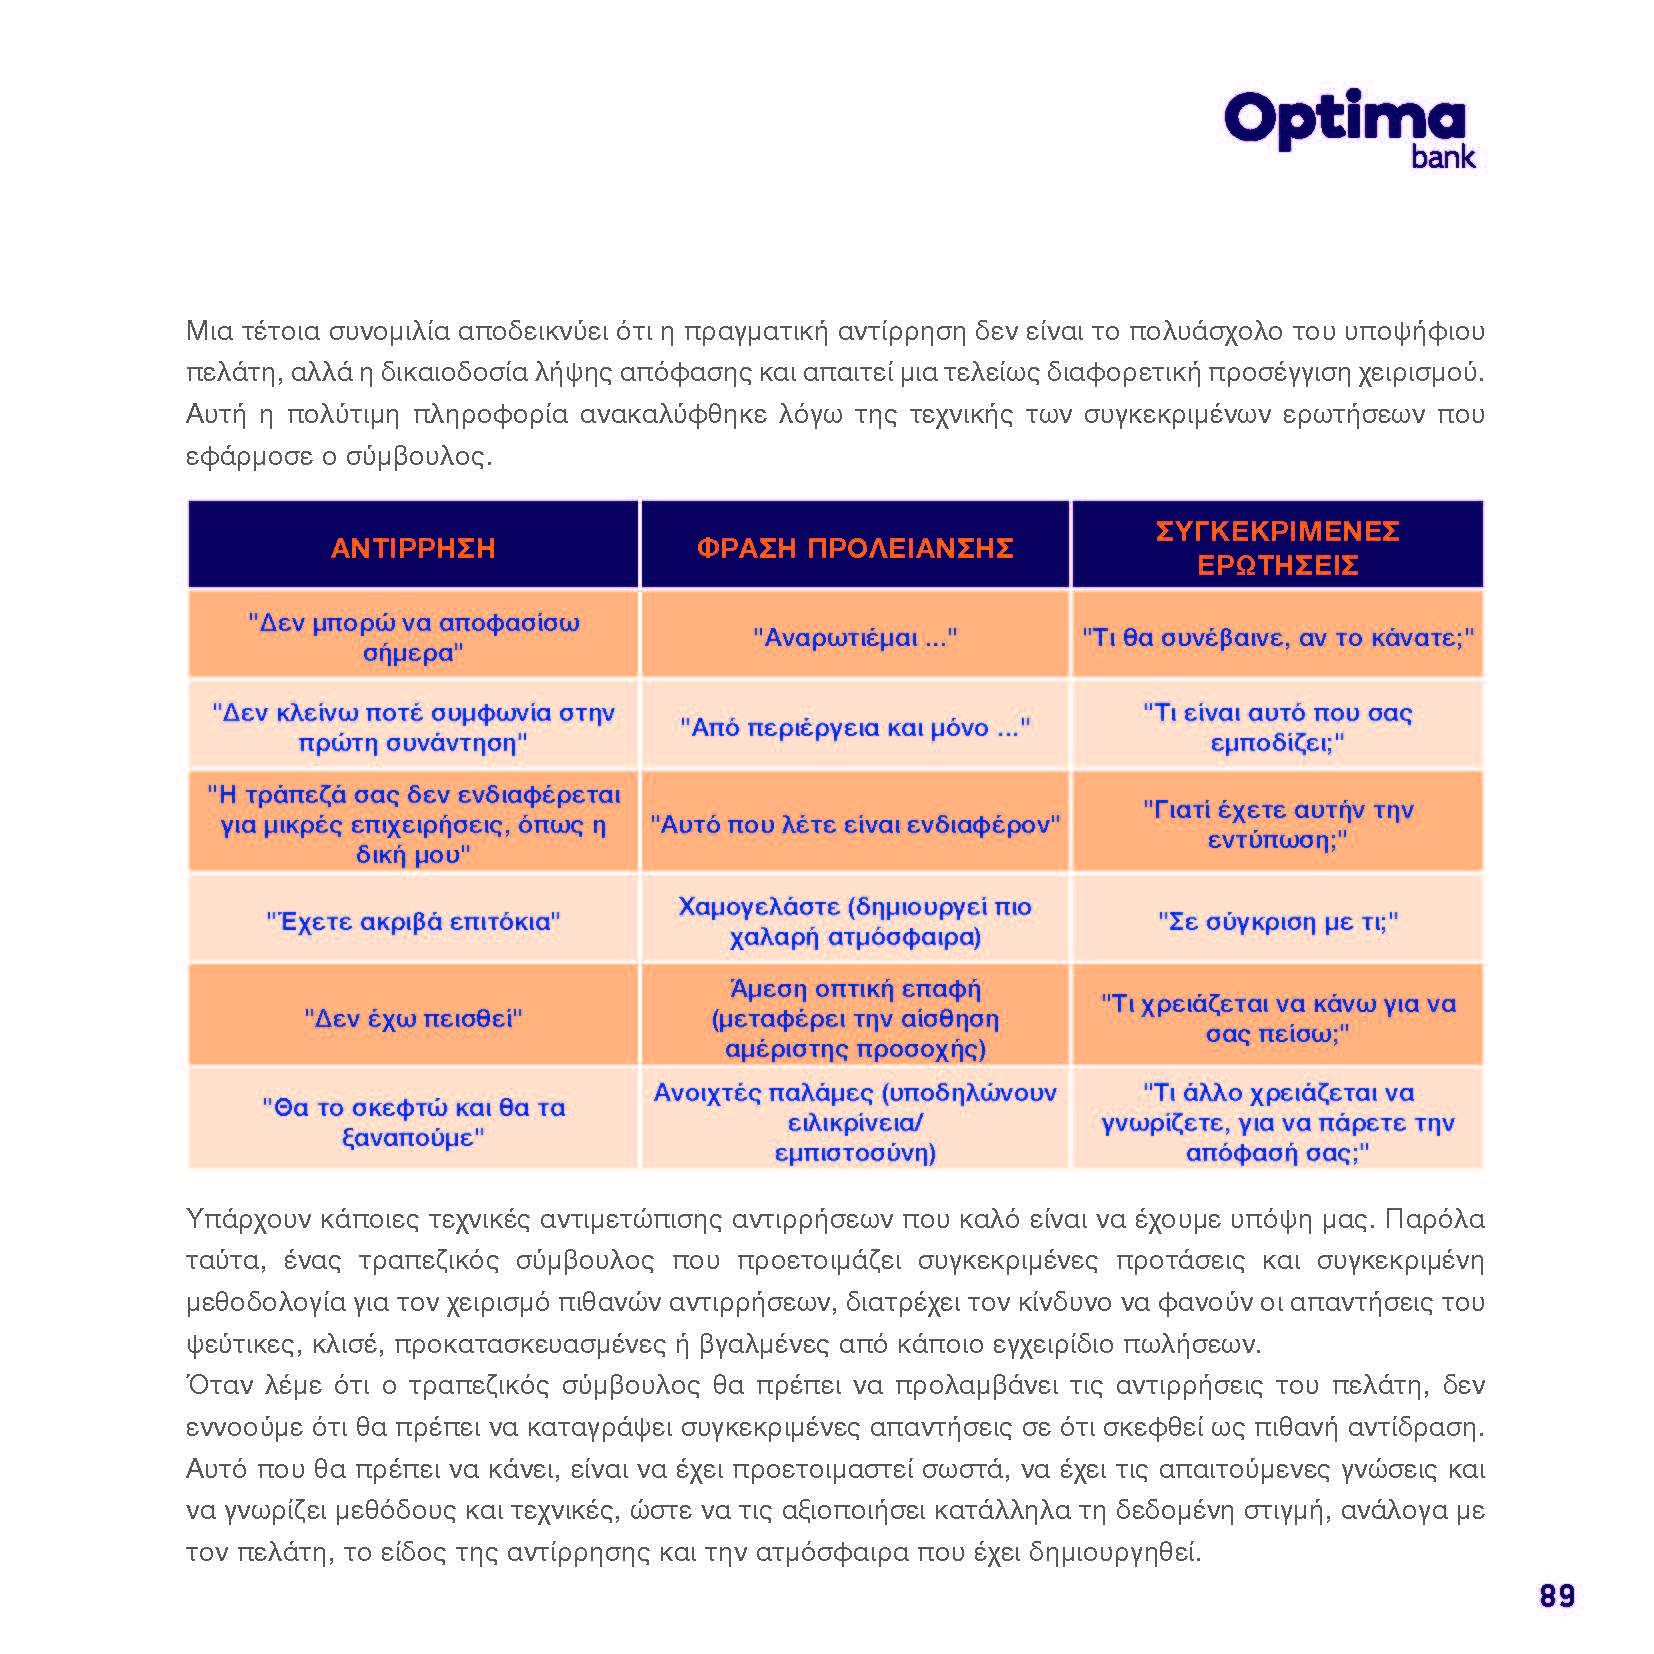 https://www.jib.gr/wp-content/uploads/2020/09/OPTIMA-BANK-BOOKLET-WEB_Page_089.jpg